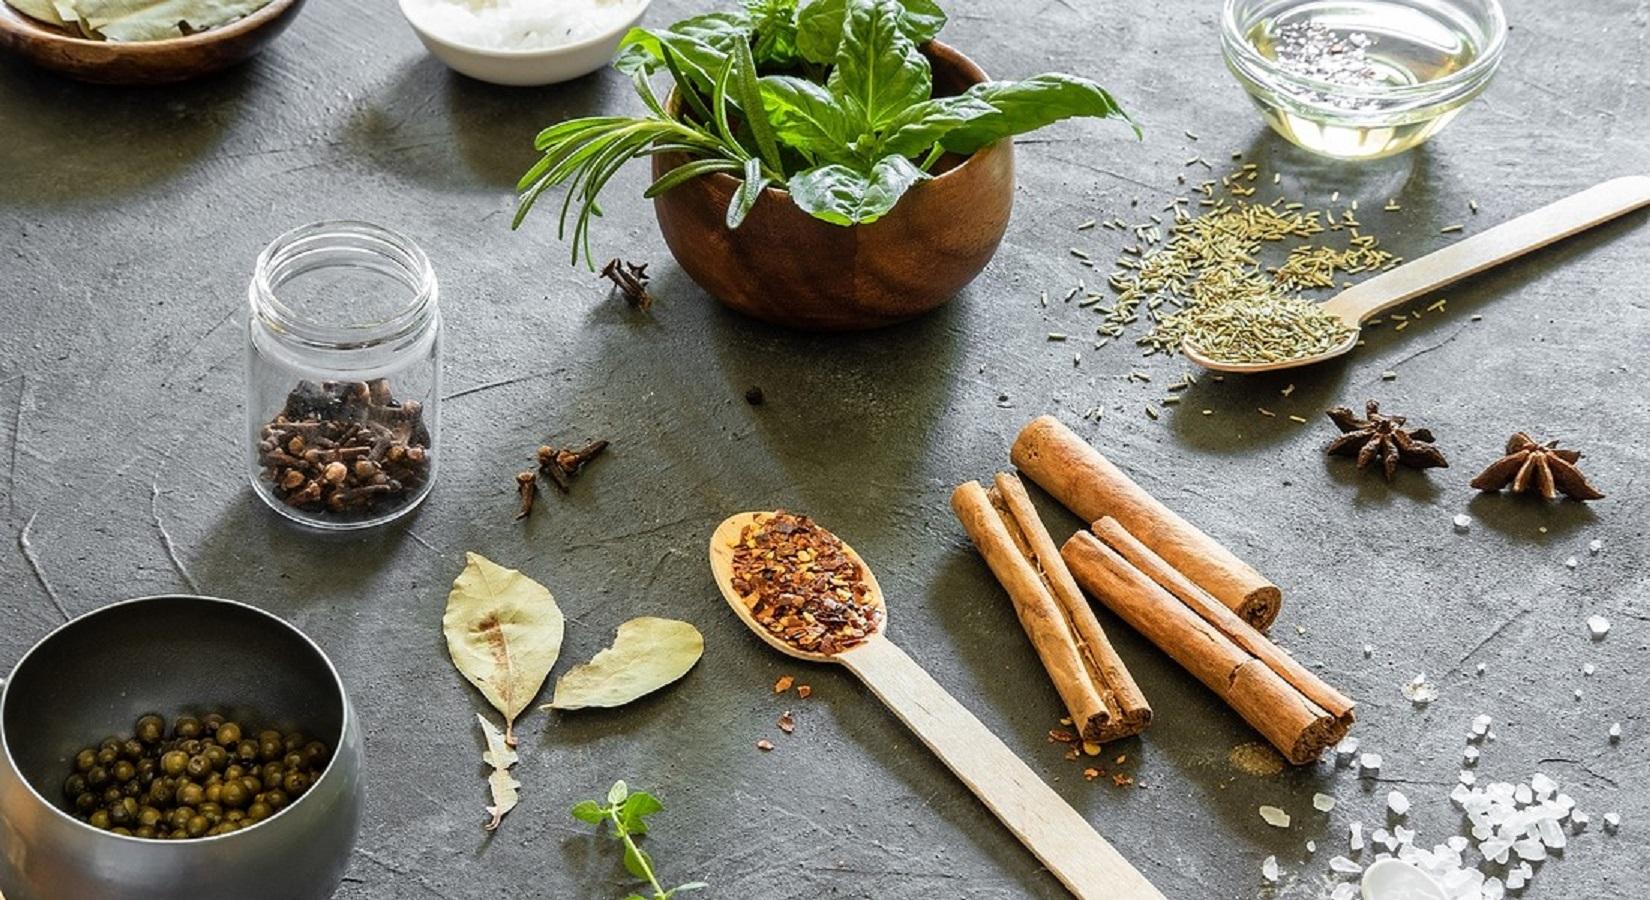 Dieta, rimedi naturali: Rhodiola, la pianta che aiuta a dimagrire